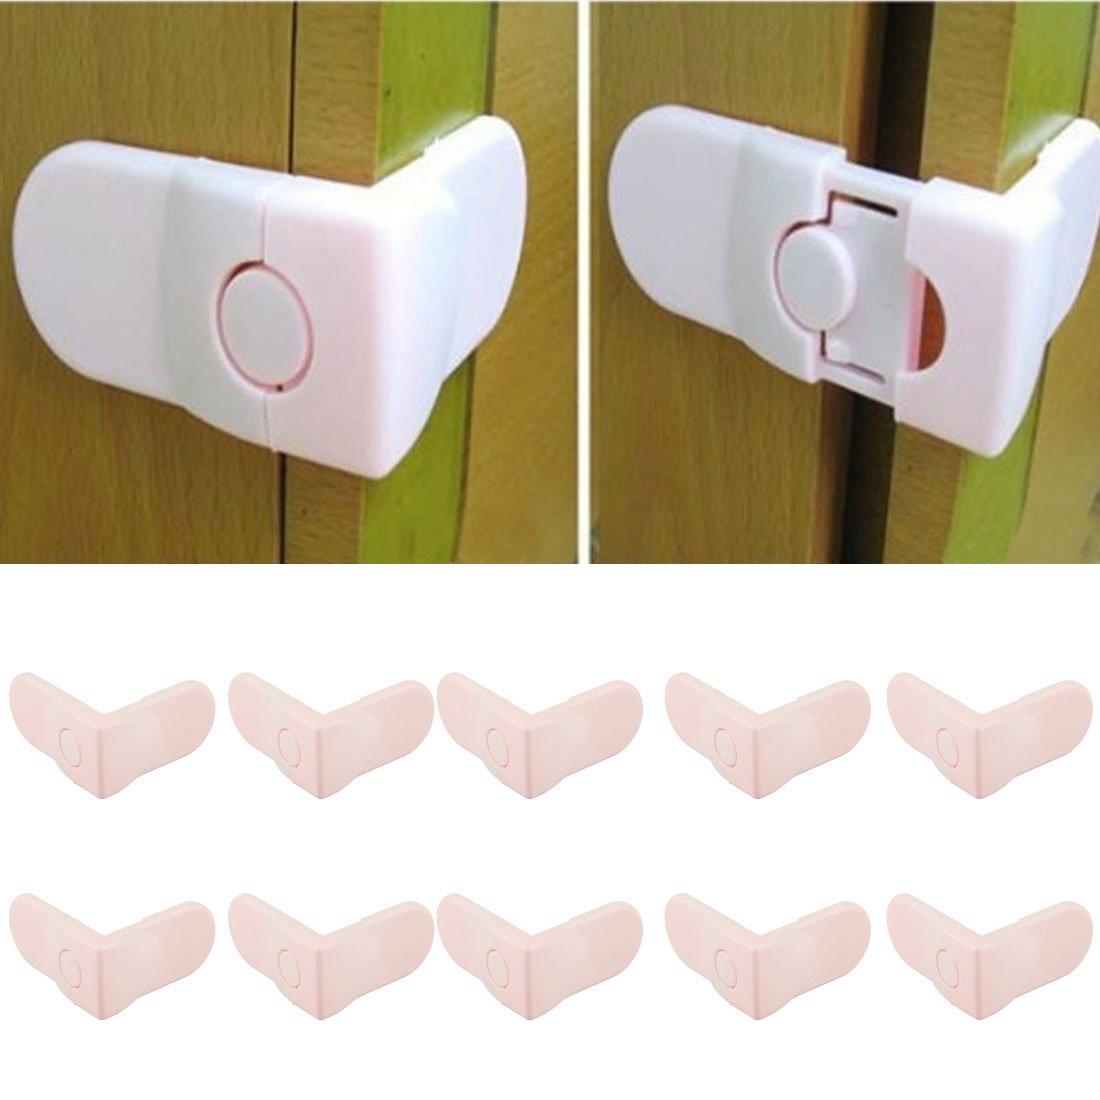 Voberry(TM) Baby Drawer Safety Lock For Door Cabinet Refrigerator Window (Pink)